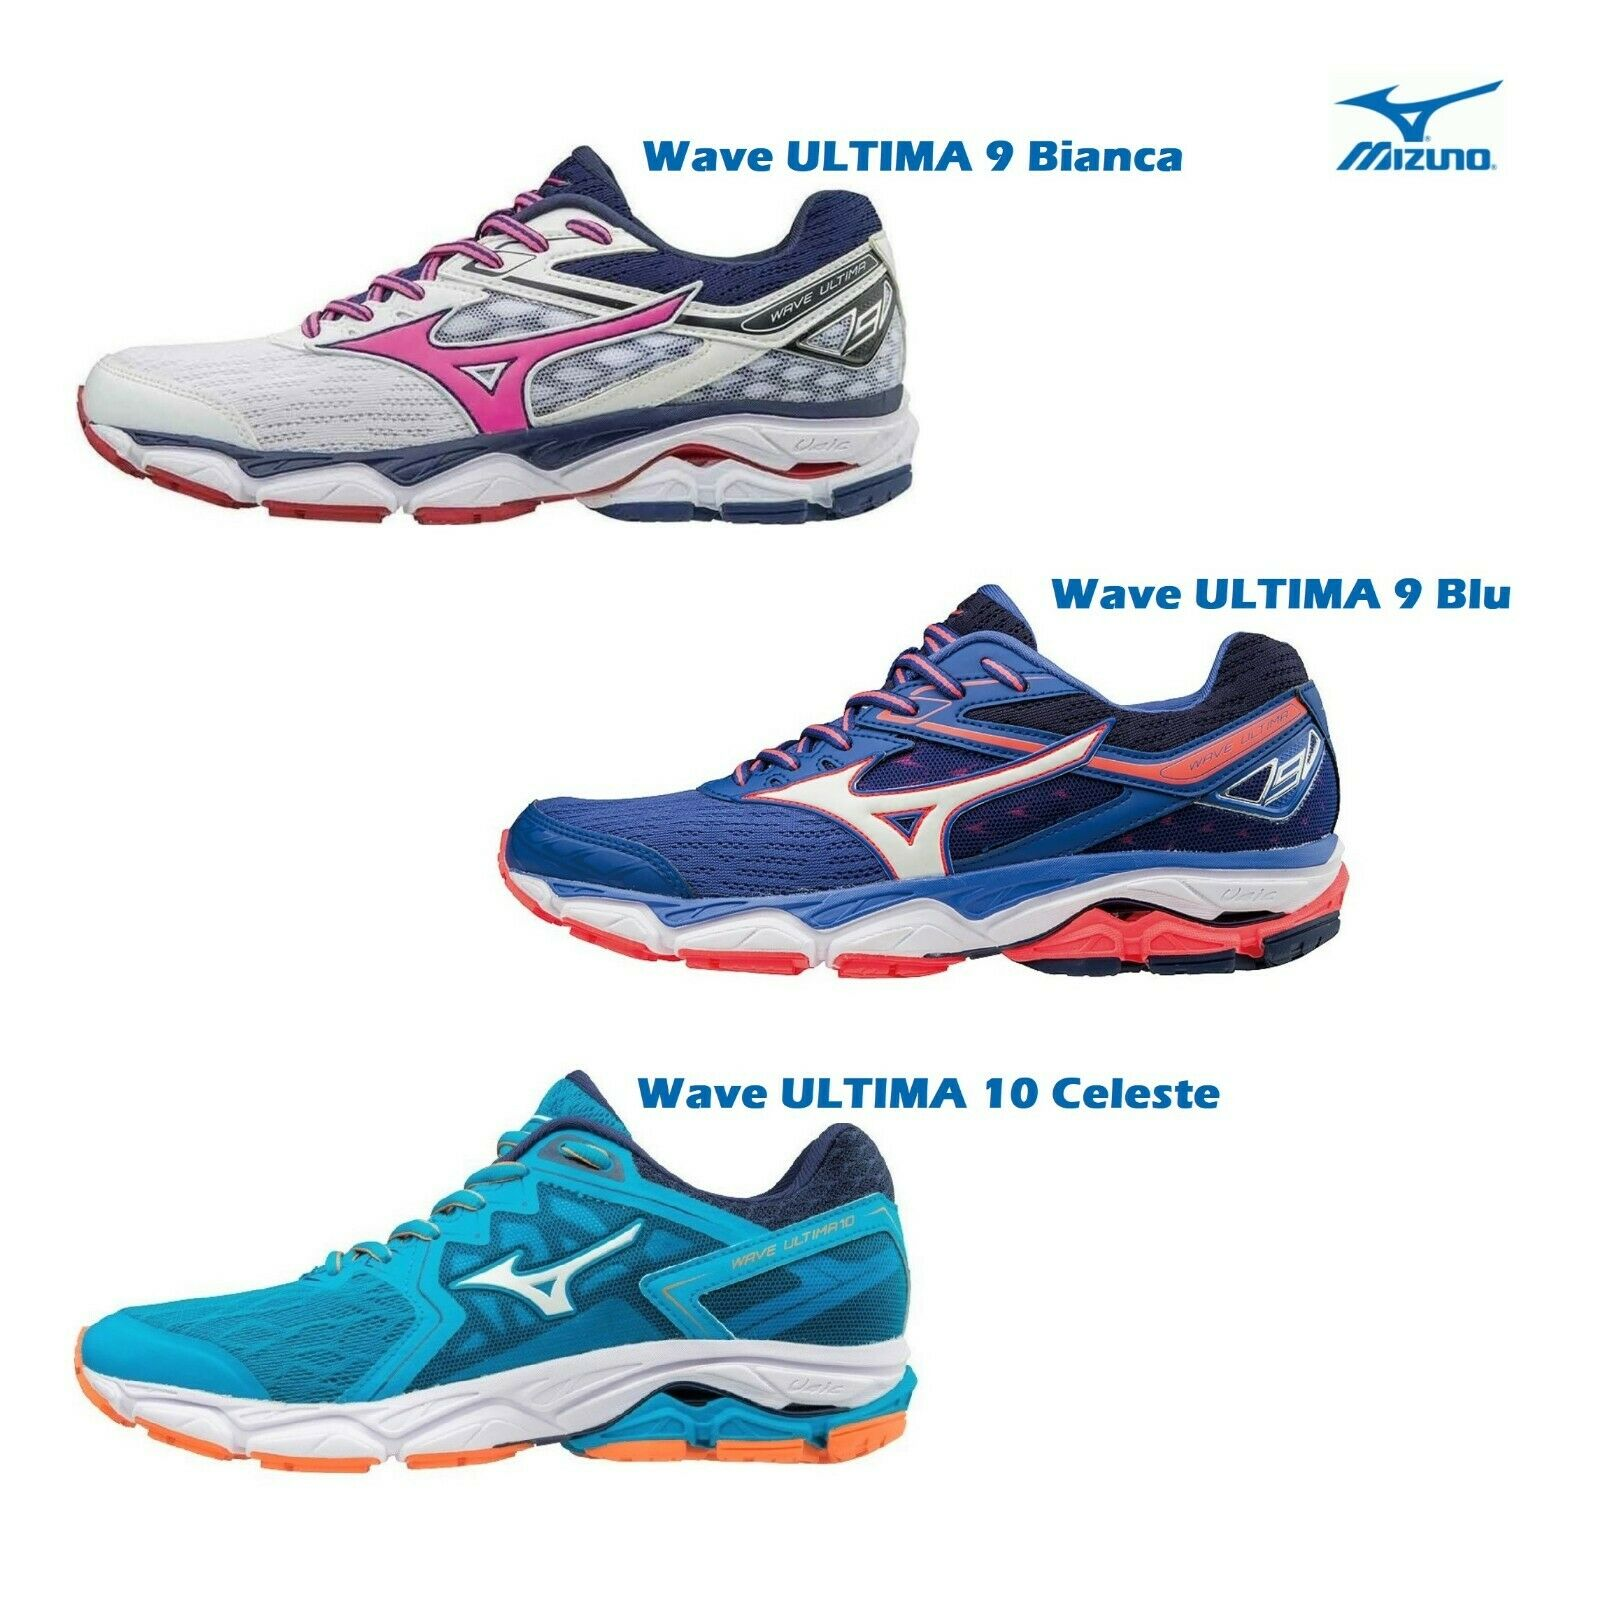 Mizuno Wave Ultima 9 and 10 femmes Trail FonctionneHommest chaussures Triathlon bleu blanc j1gd18